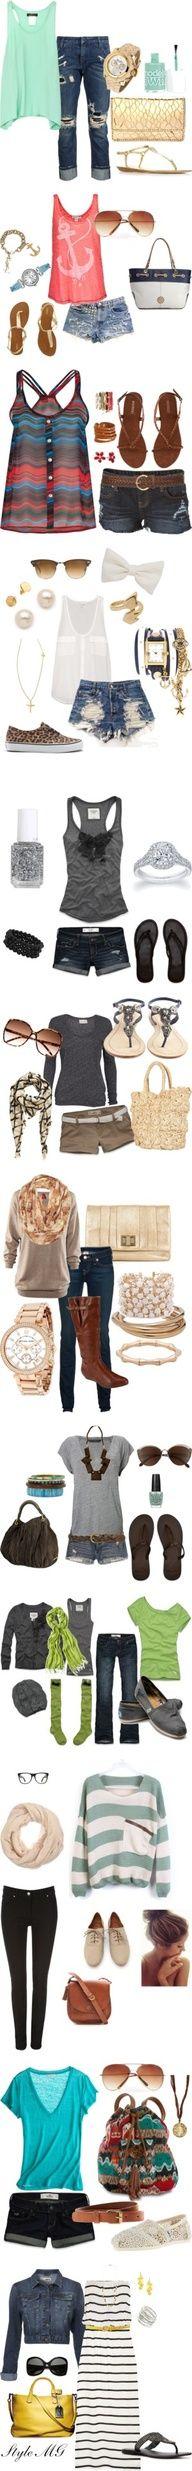 shoulder purse bag  Lori Munoz on Timeless style